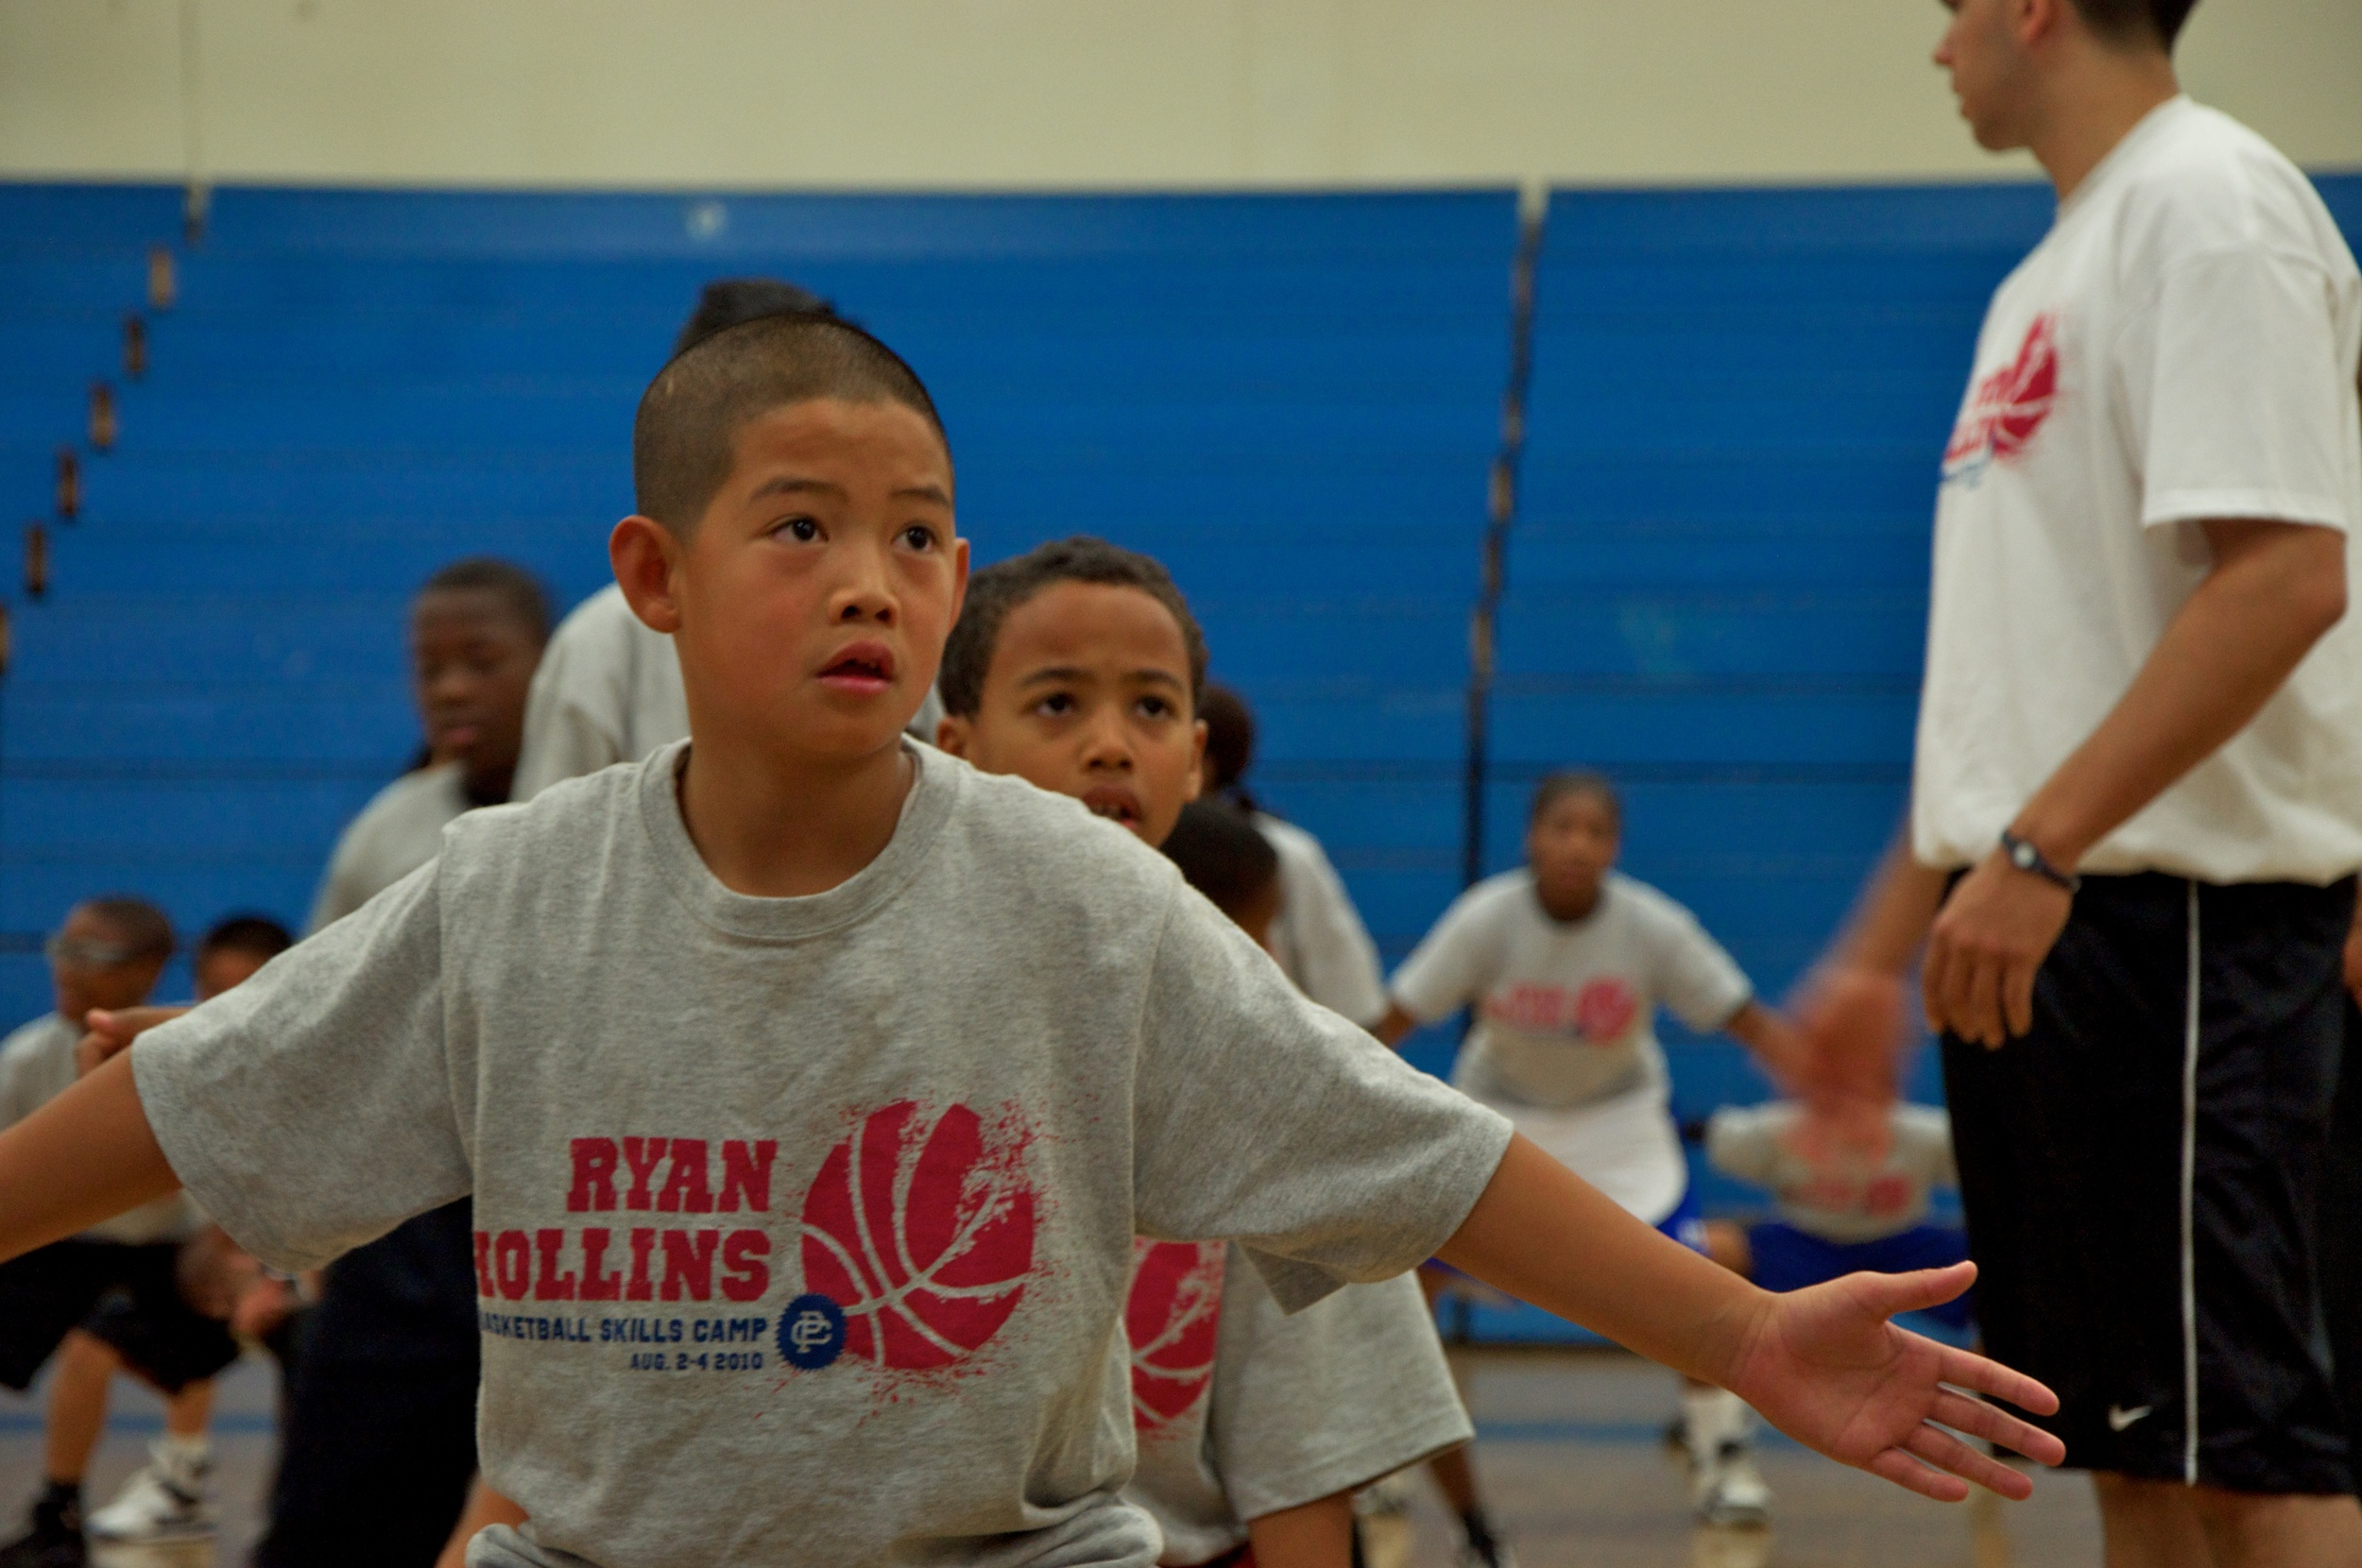 Ryan Hollins Basketball Camp 17.jpg